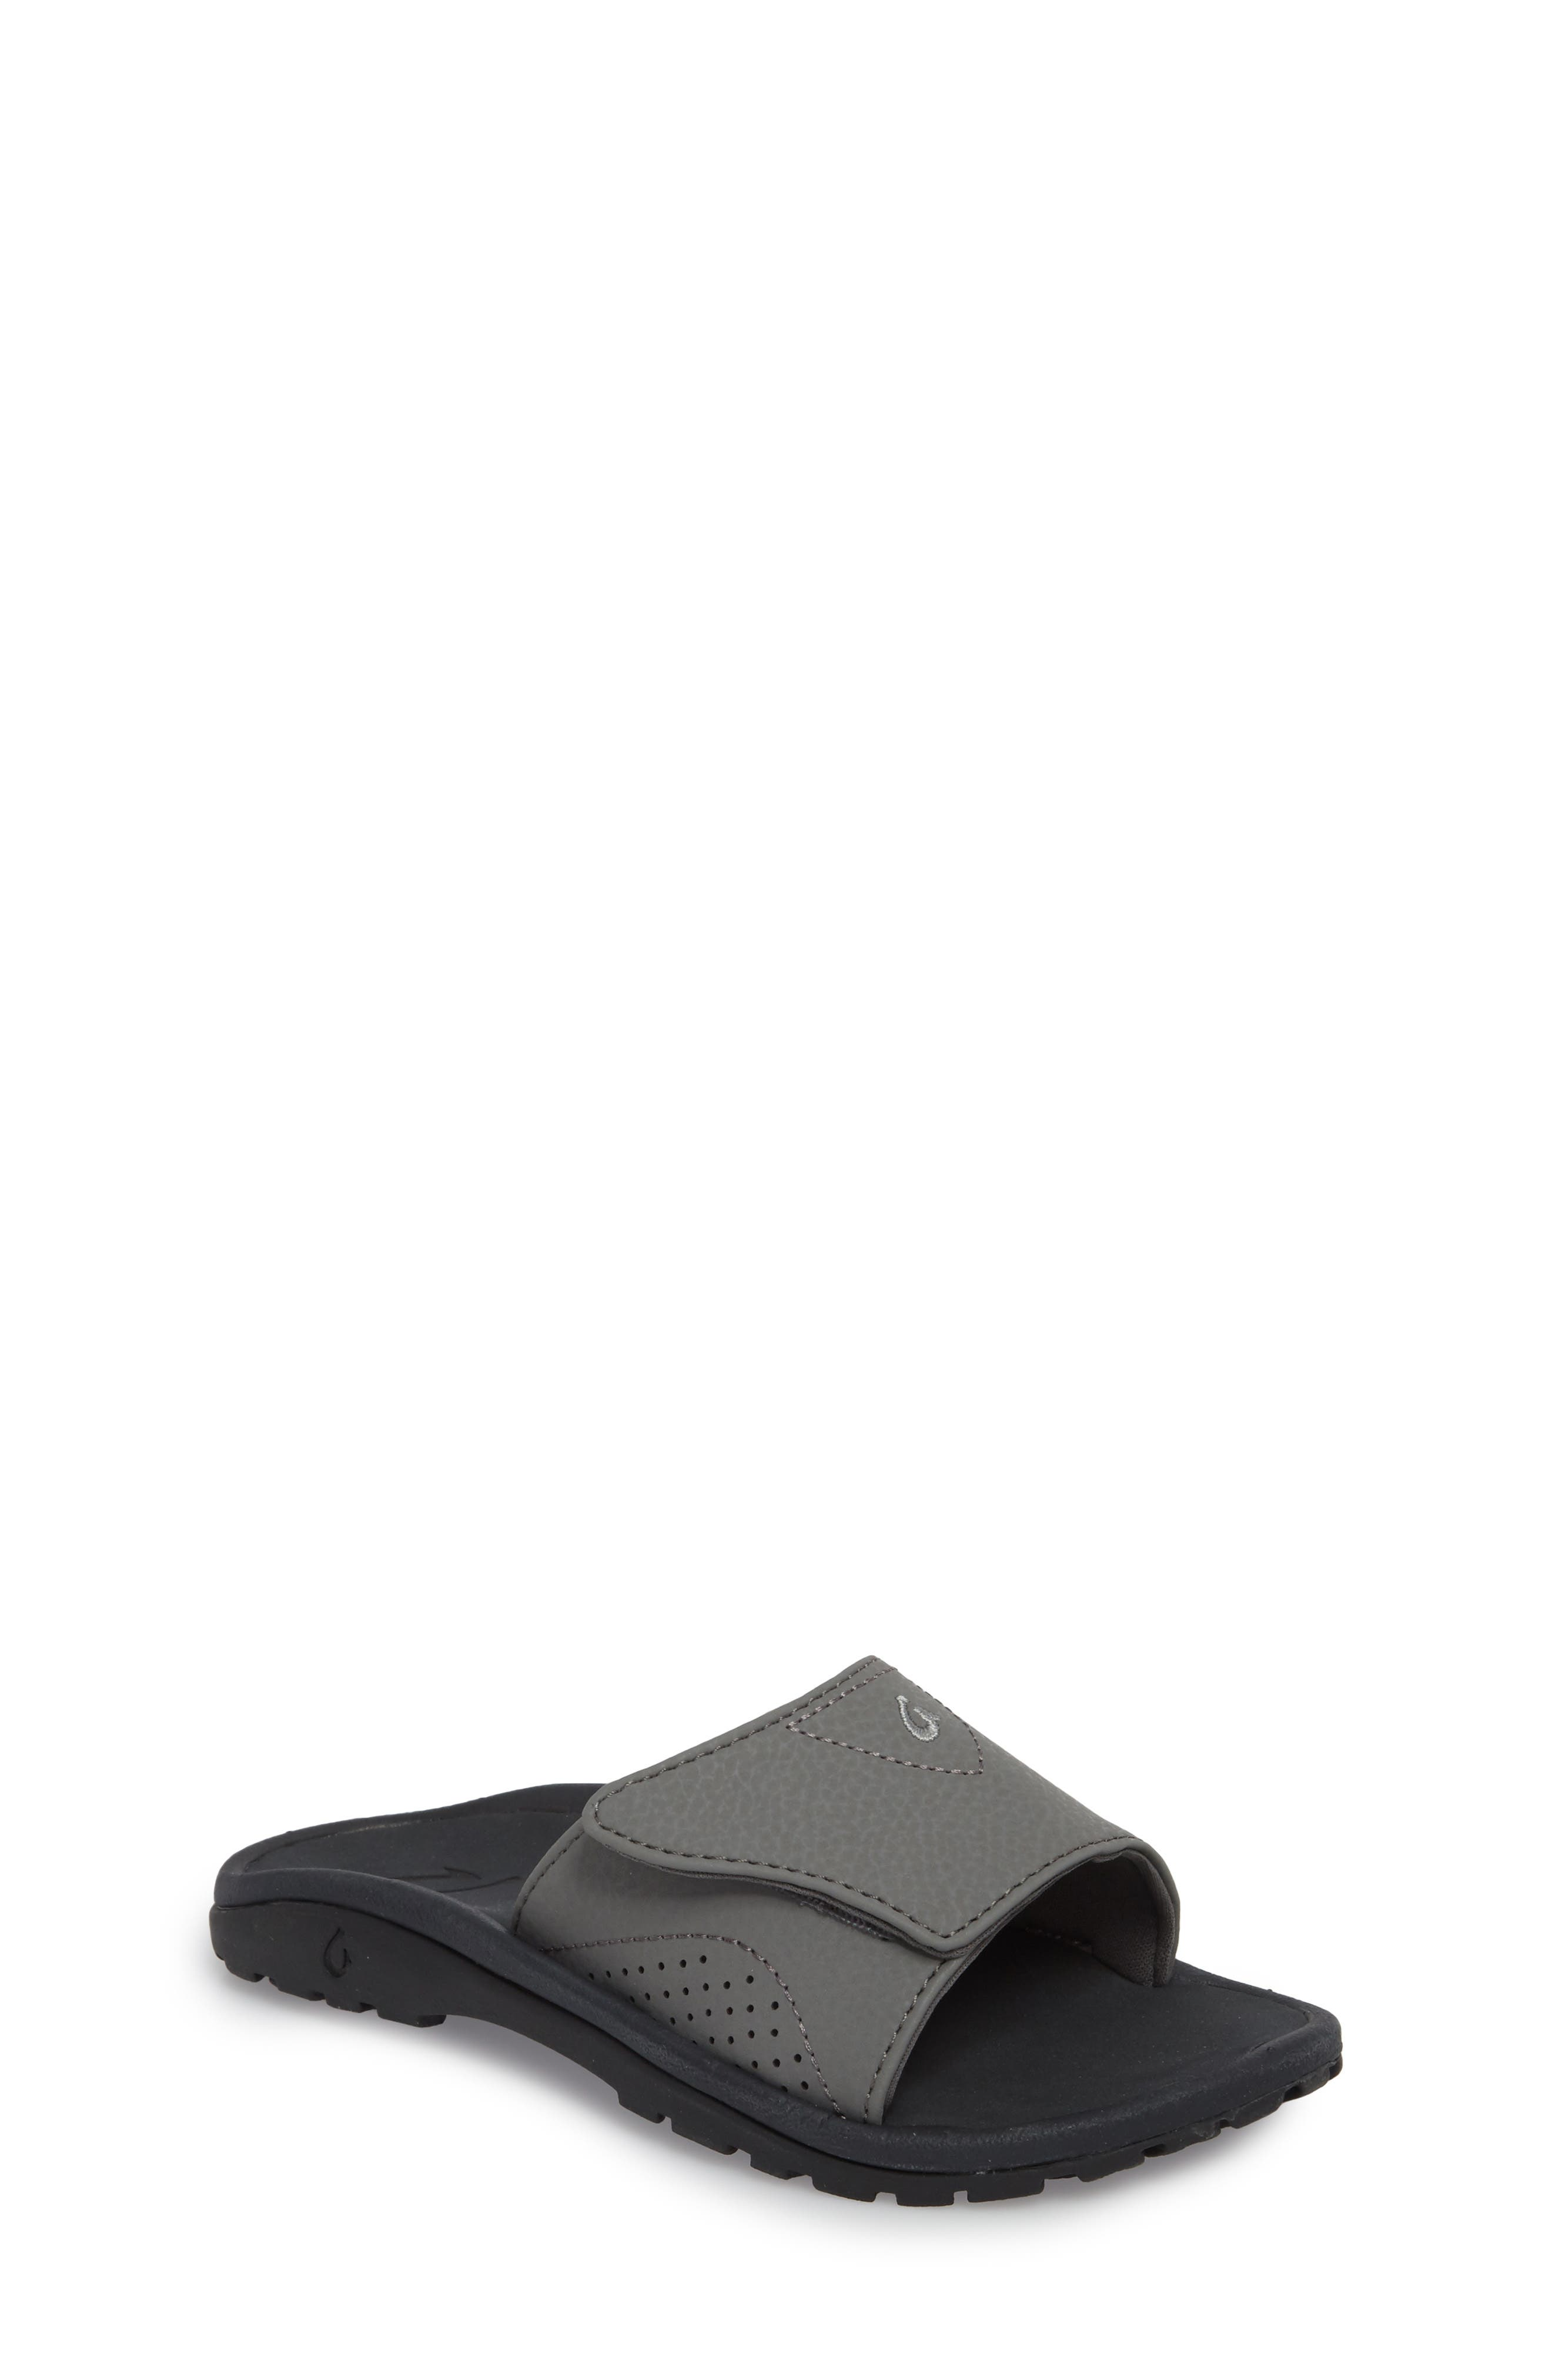 OLUKAI Nalu Slide Sandal, Main, color, CHARCOAL/ LAVA ROCK